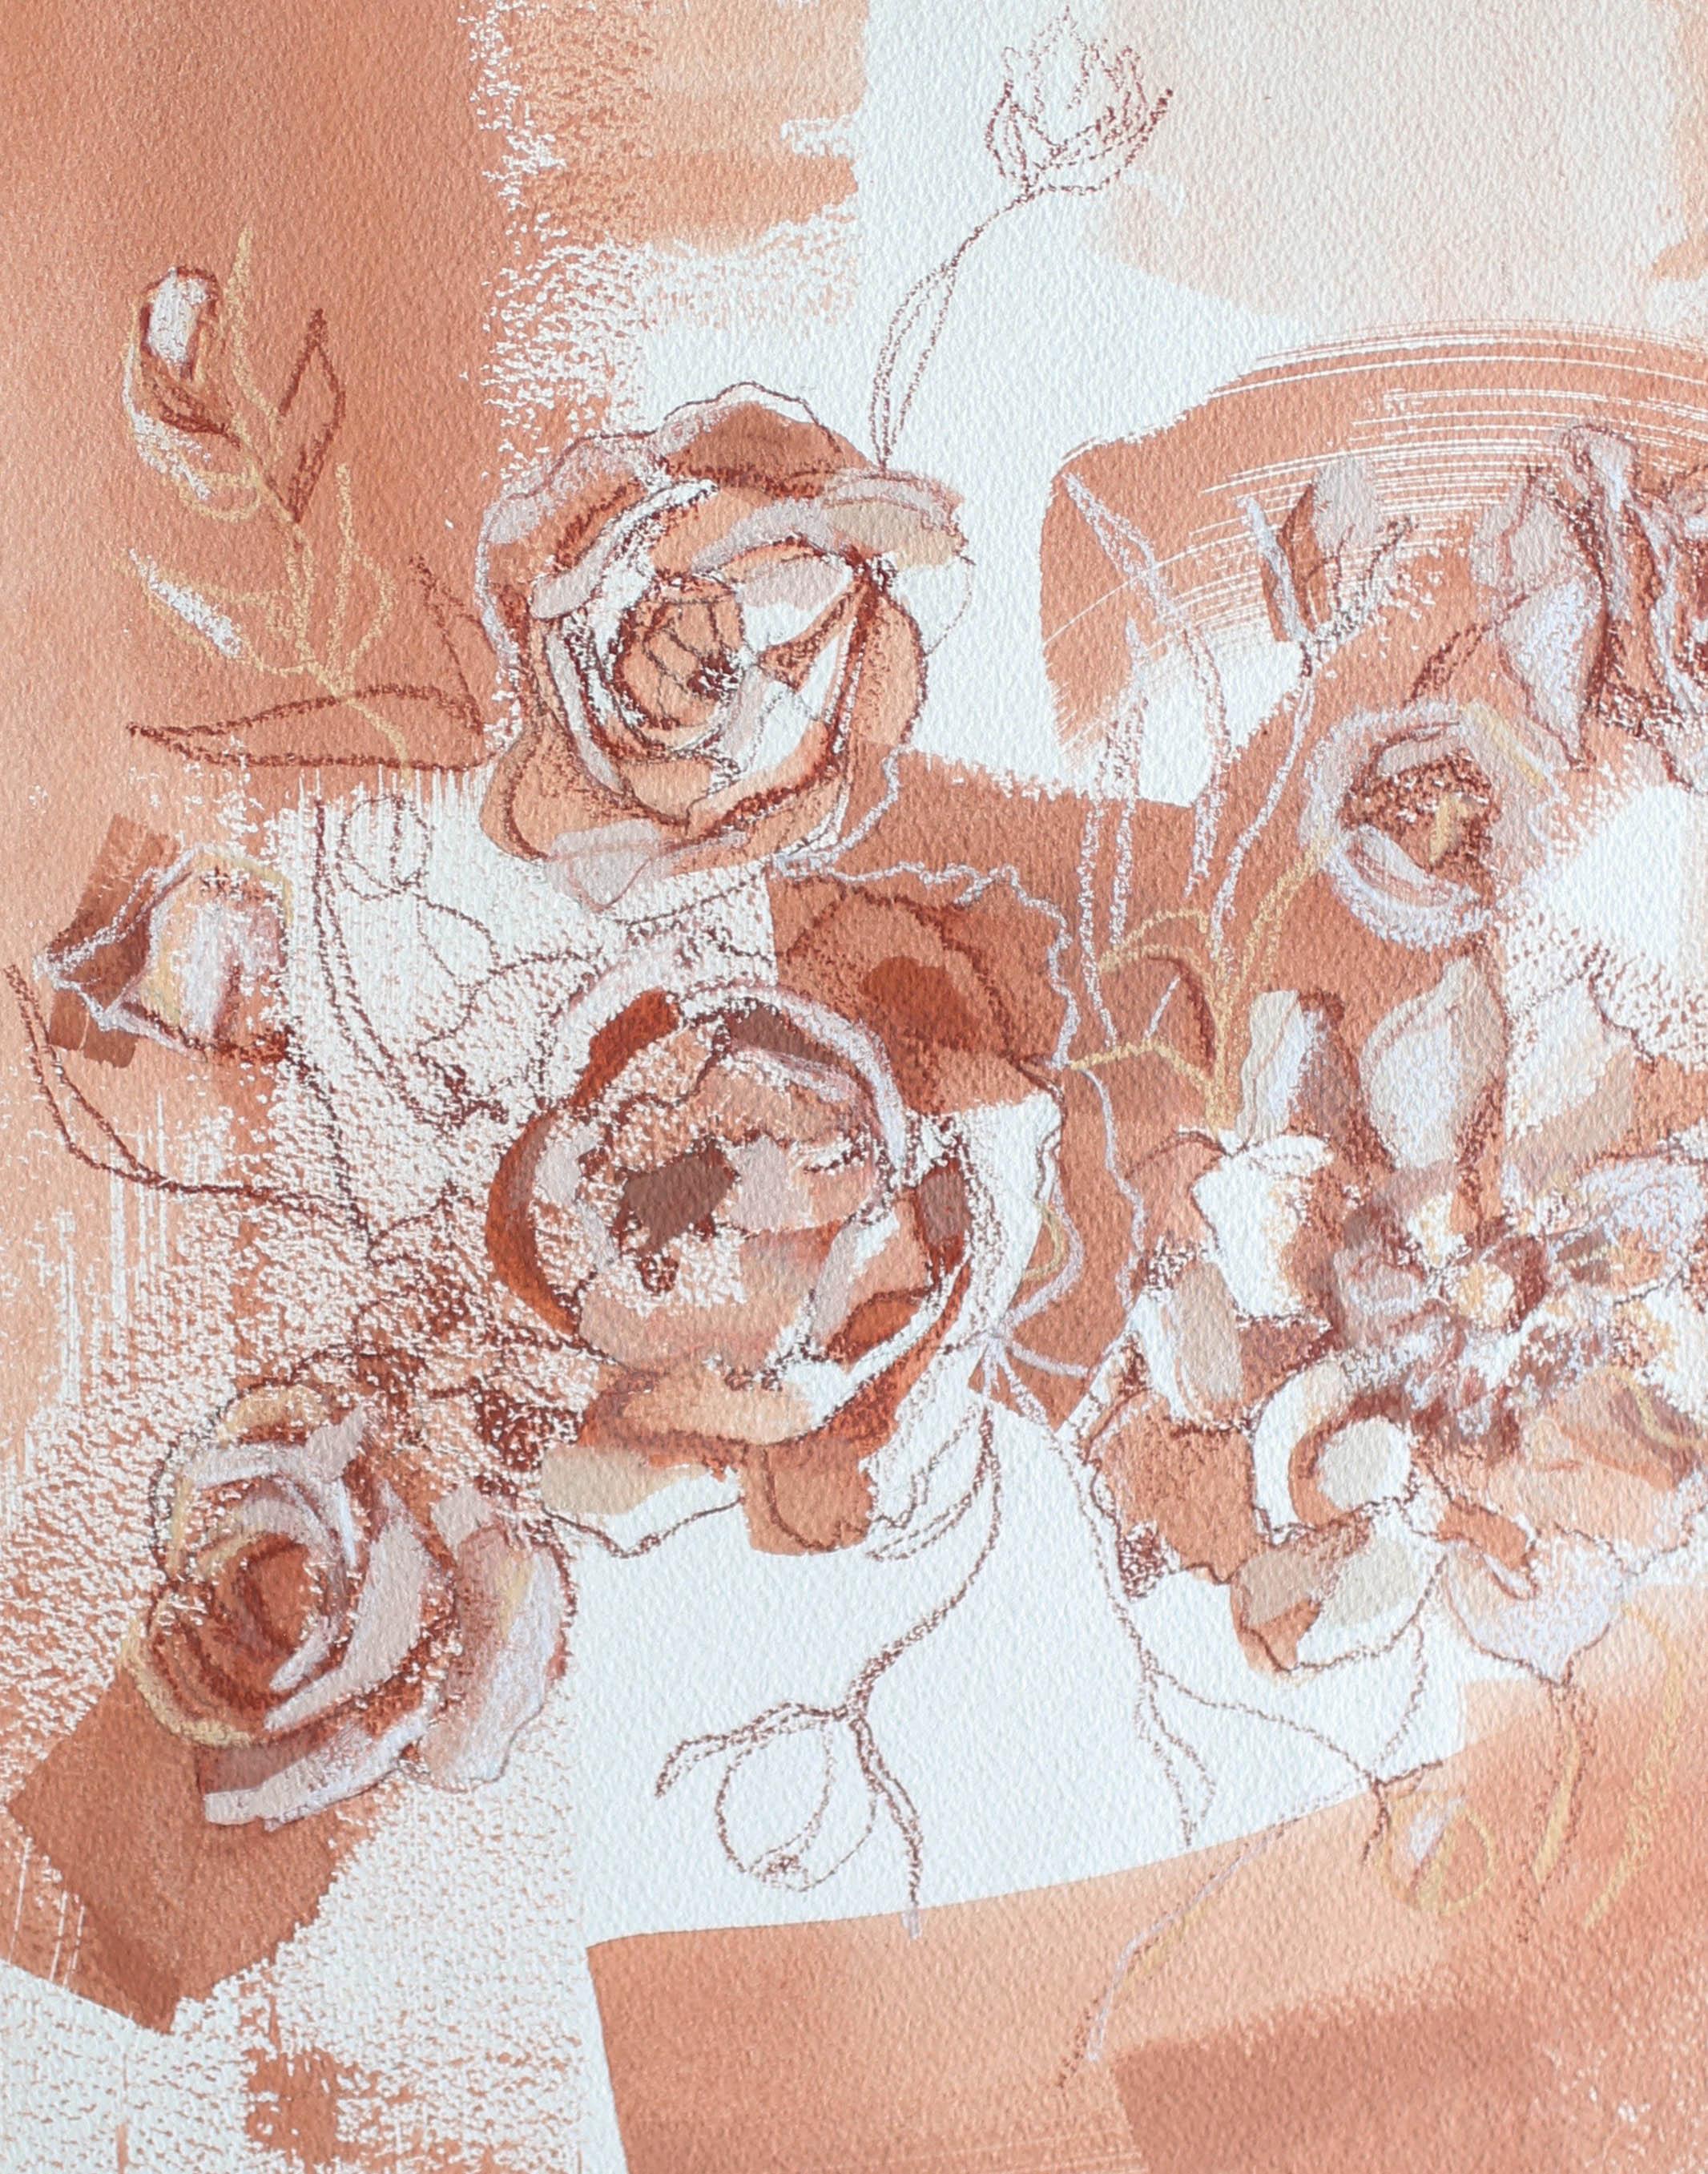 Wild Roses for Zoe, 11x14 Katherine Corden Art